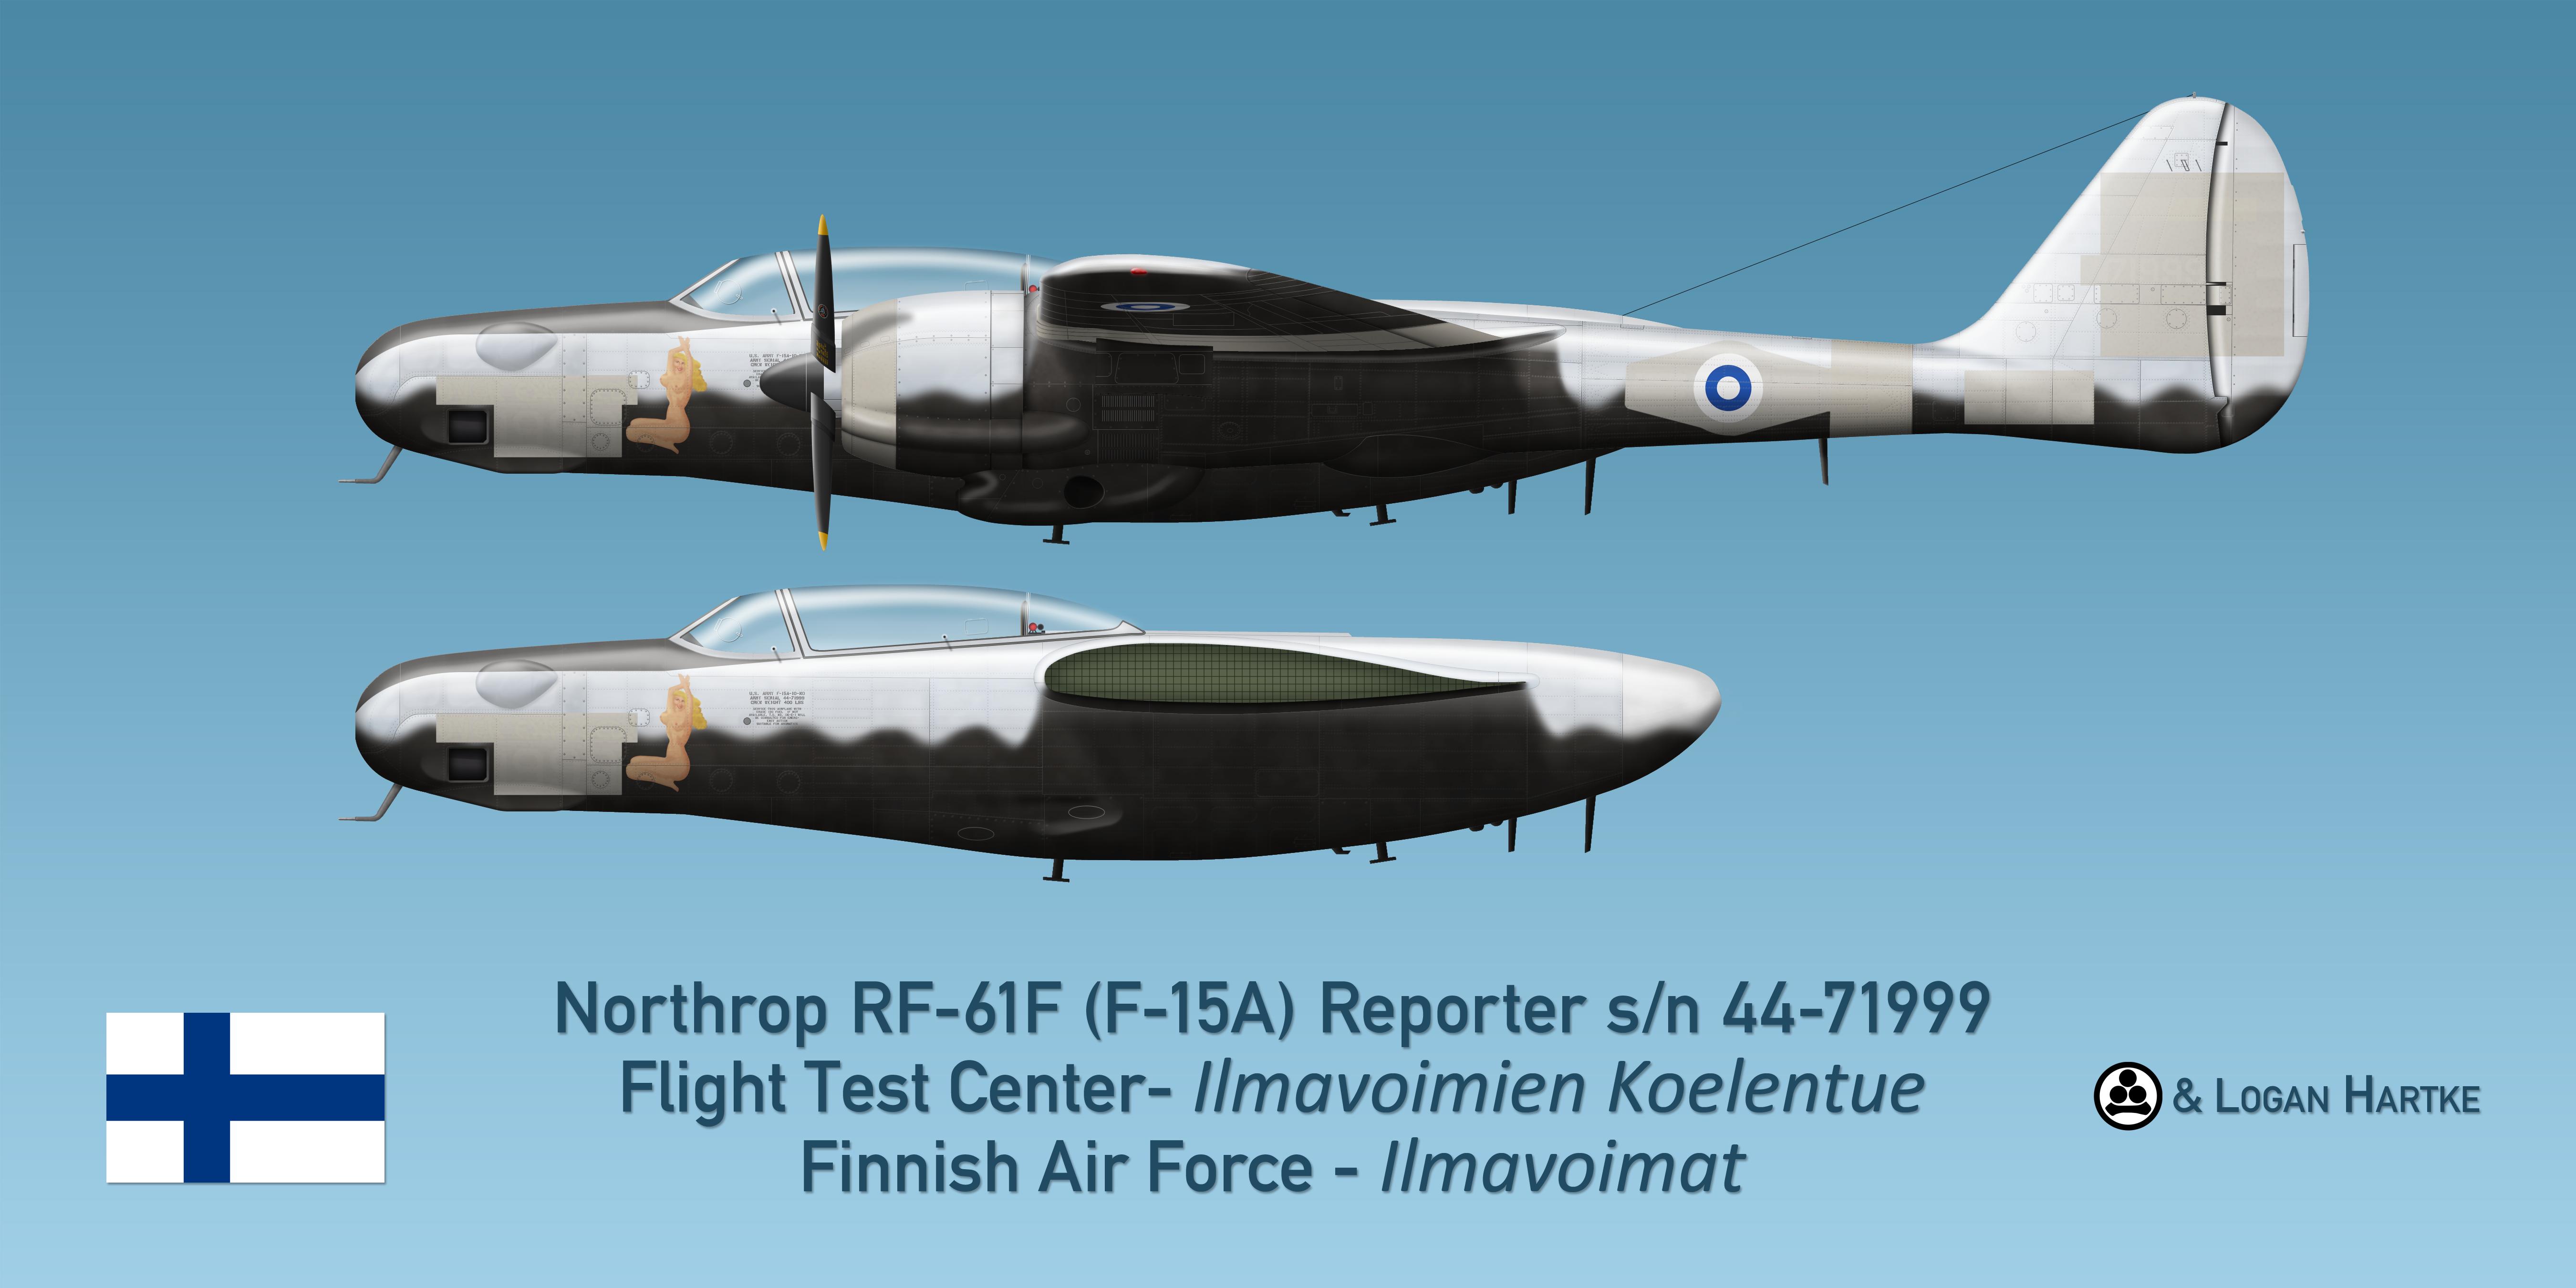 Finnish RF-61F Reporter - Over Exposed!